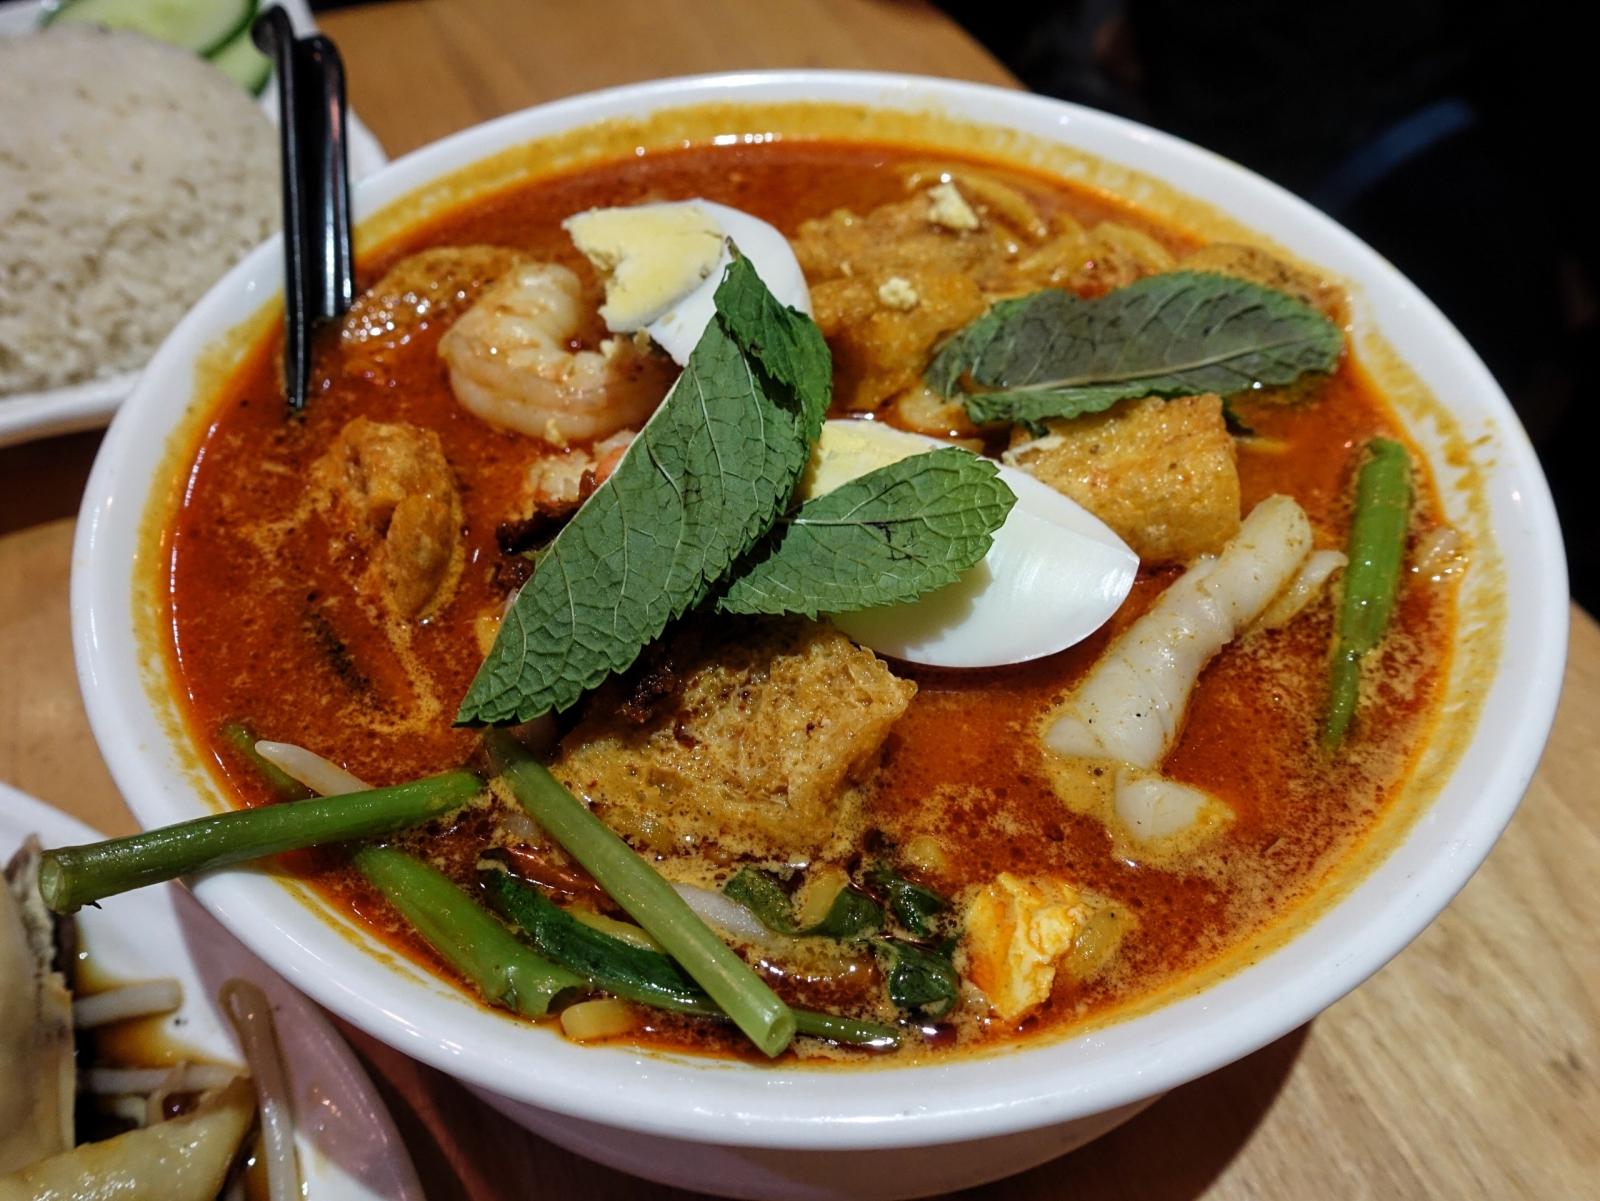 Curry laksa at Rasa Sayang in London